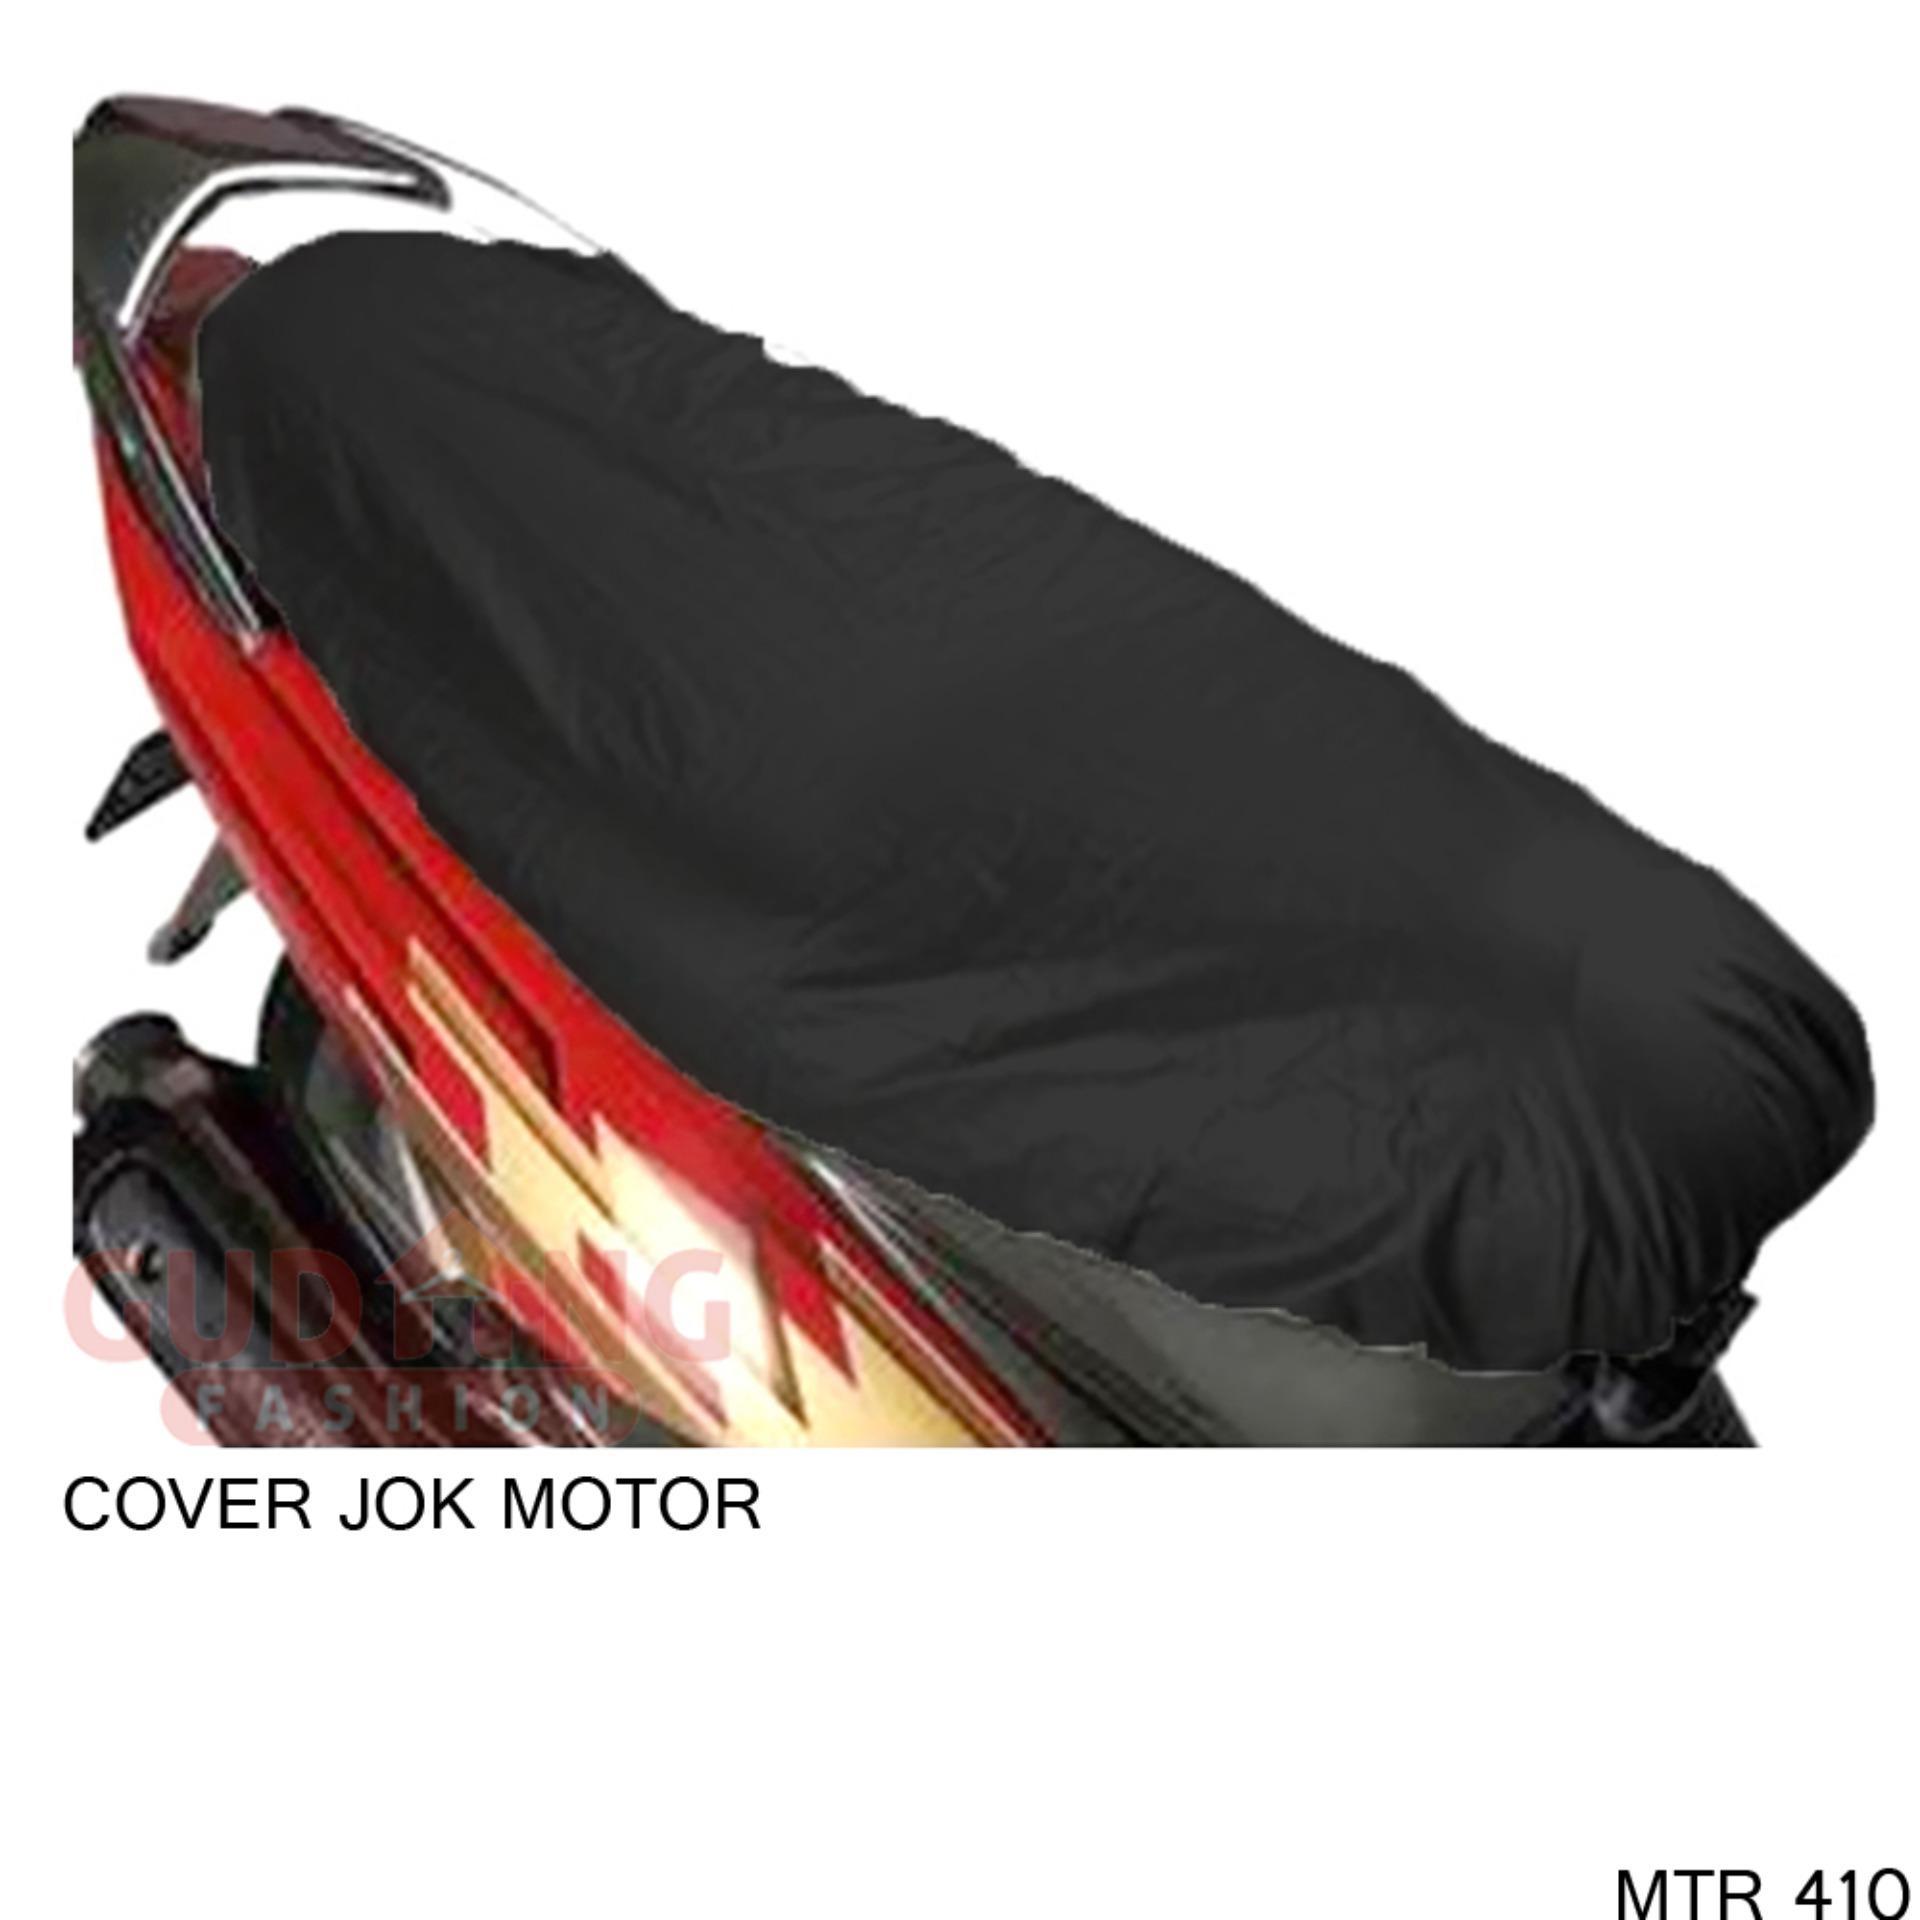 Gudang Fashion - Cover Jok Motor - Hitam